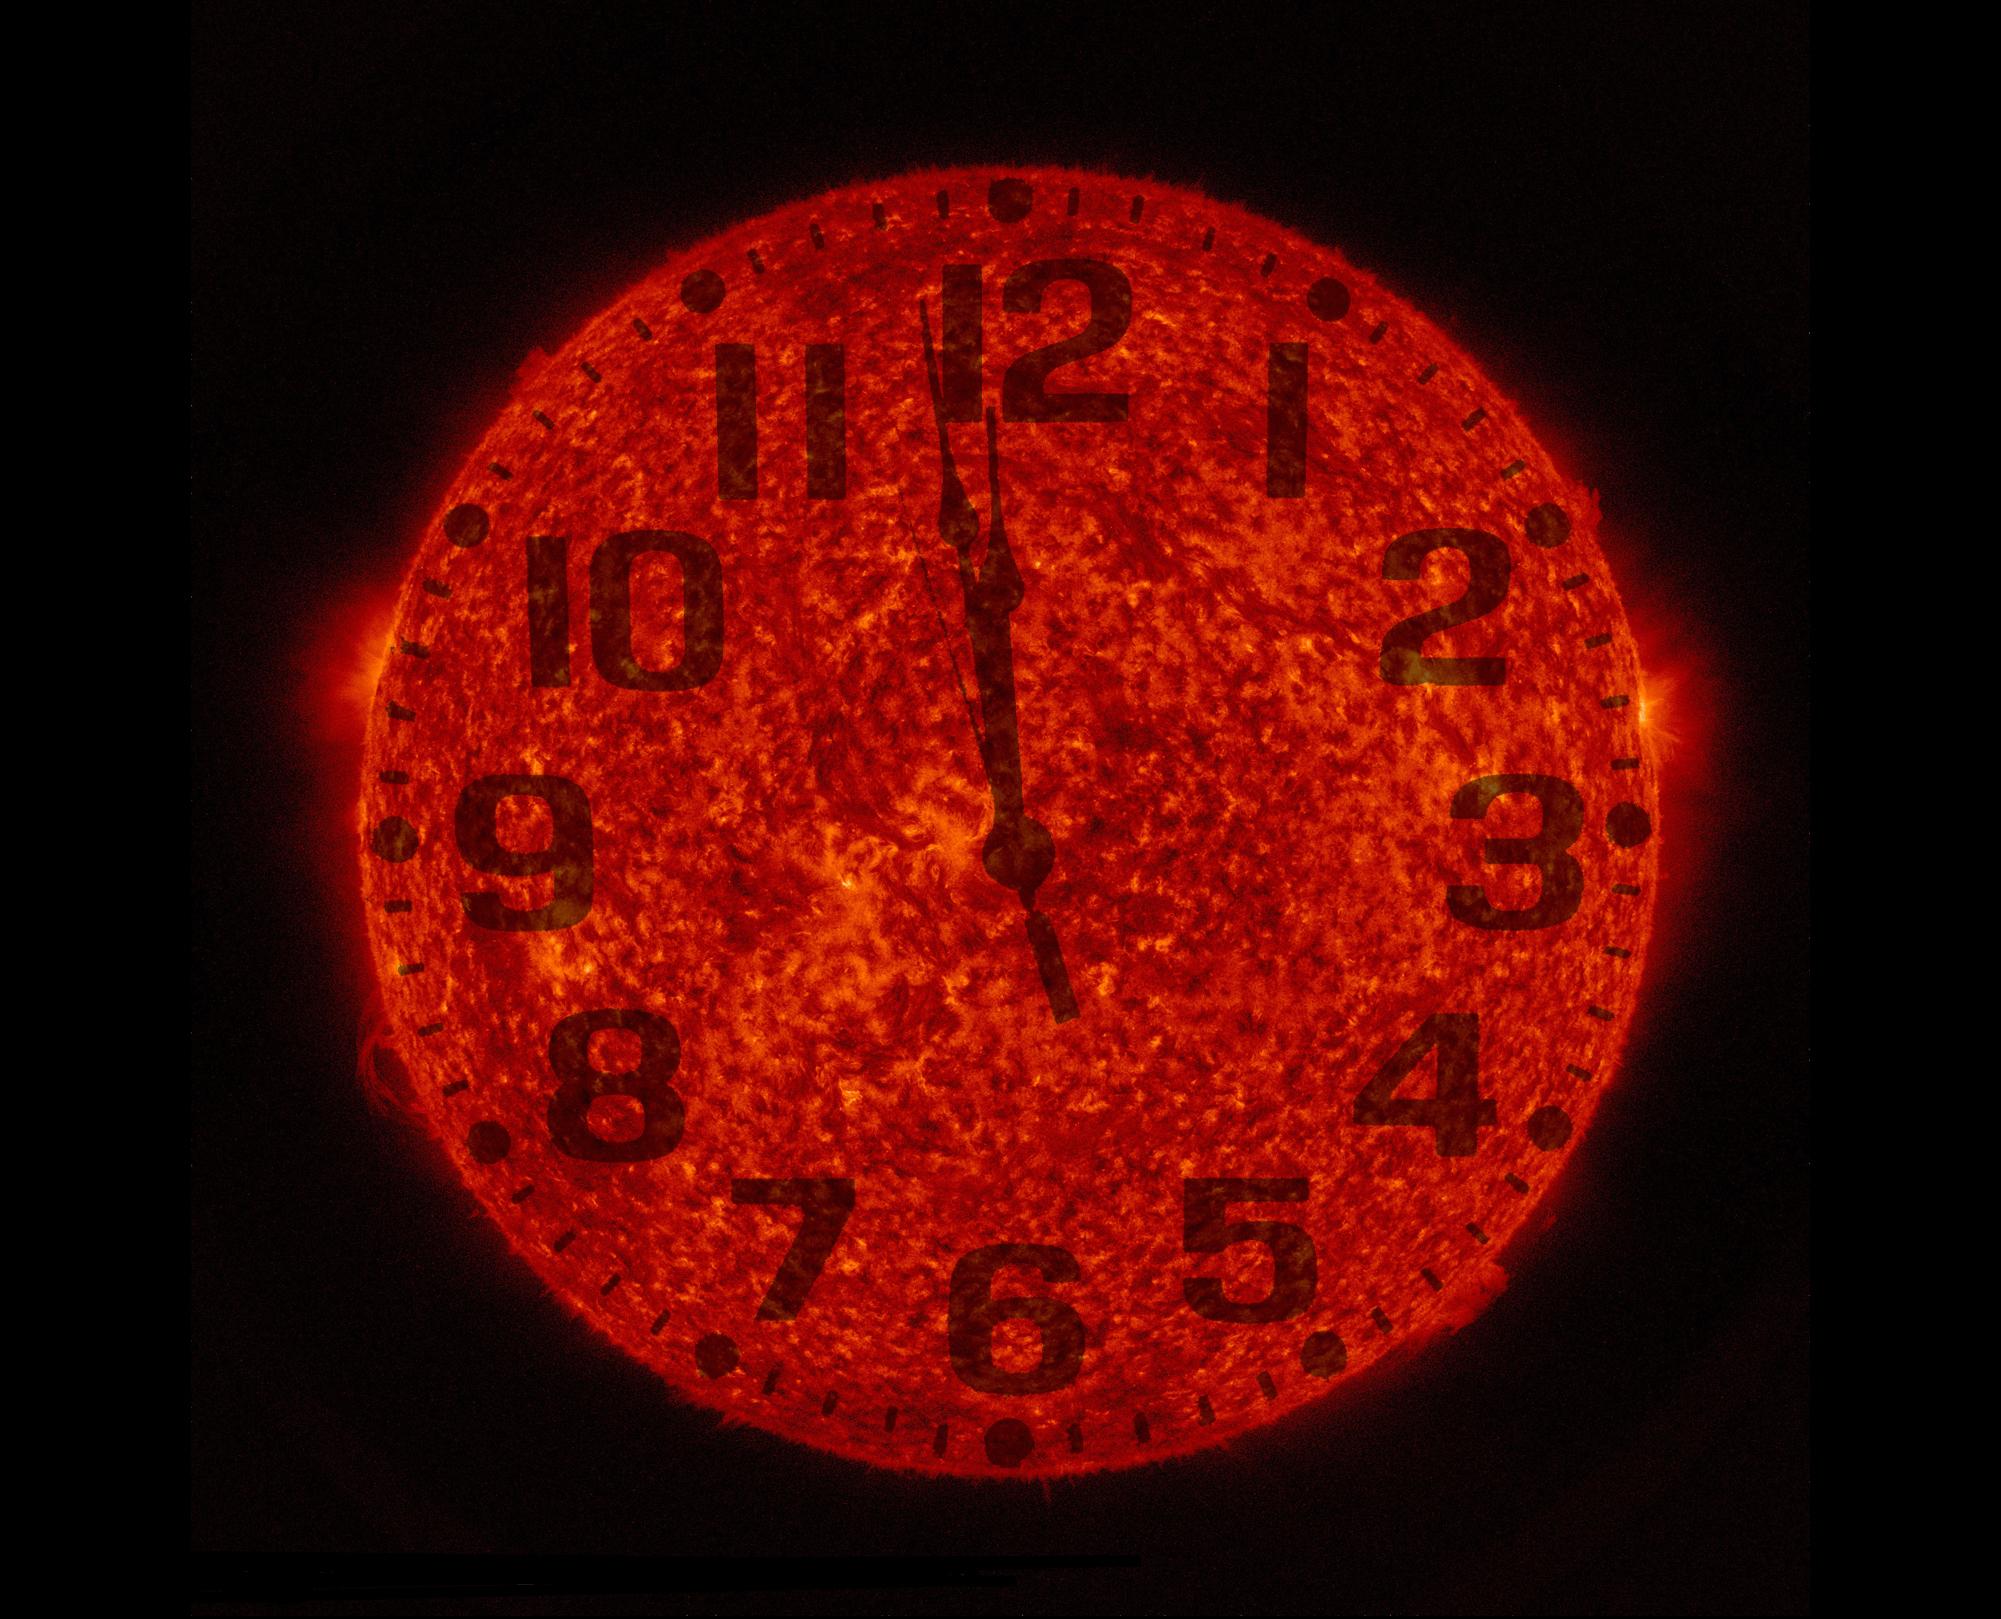 Dommedagsklokka (Foto: NASA Goddard Photo and Video/Flickr)